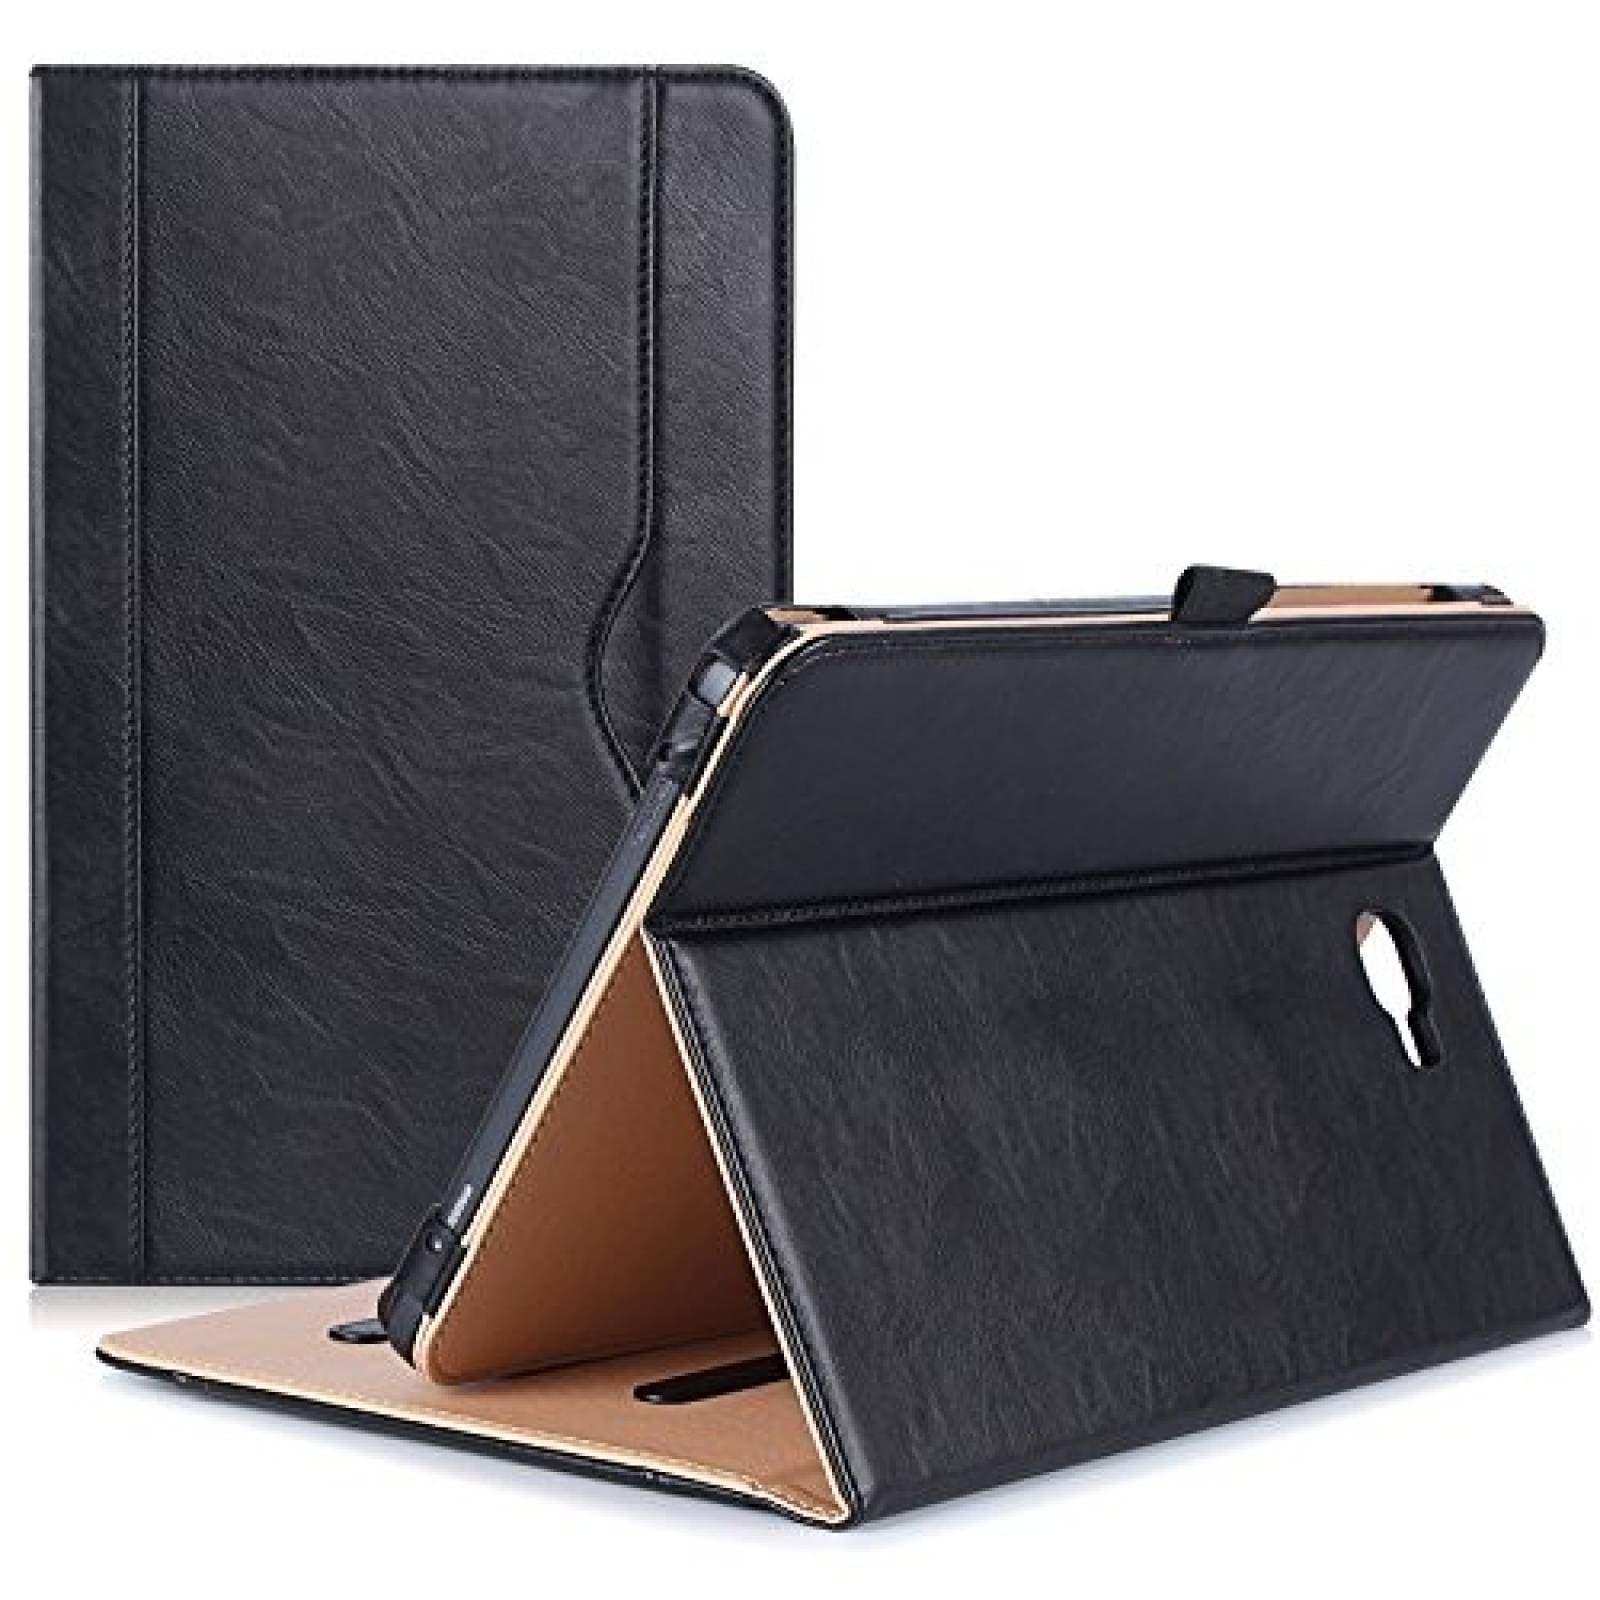 Funda ProCase para Galaxy Tab A10. 1 Negro